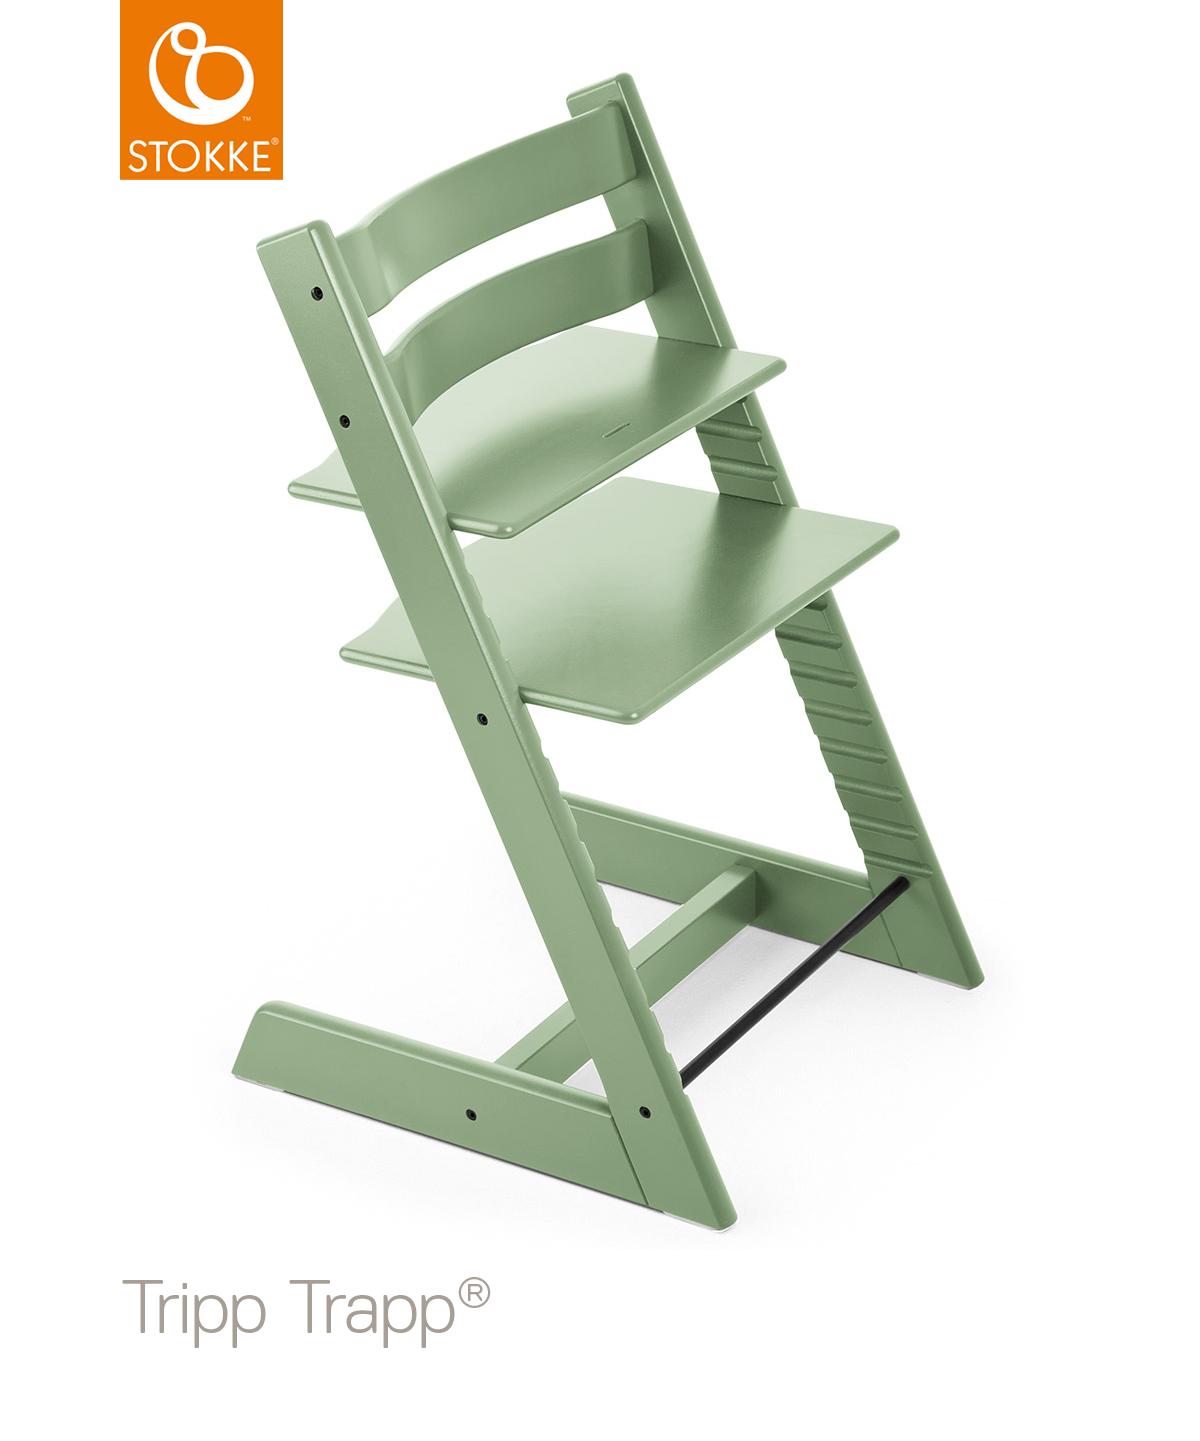 Tripp Trapp_Moss Green